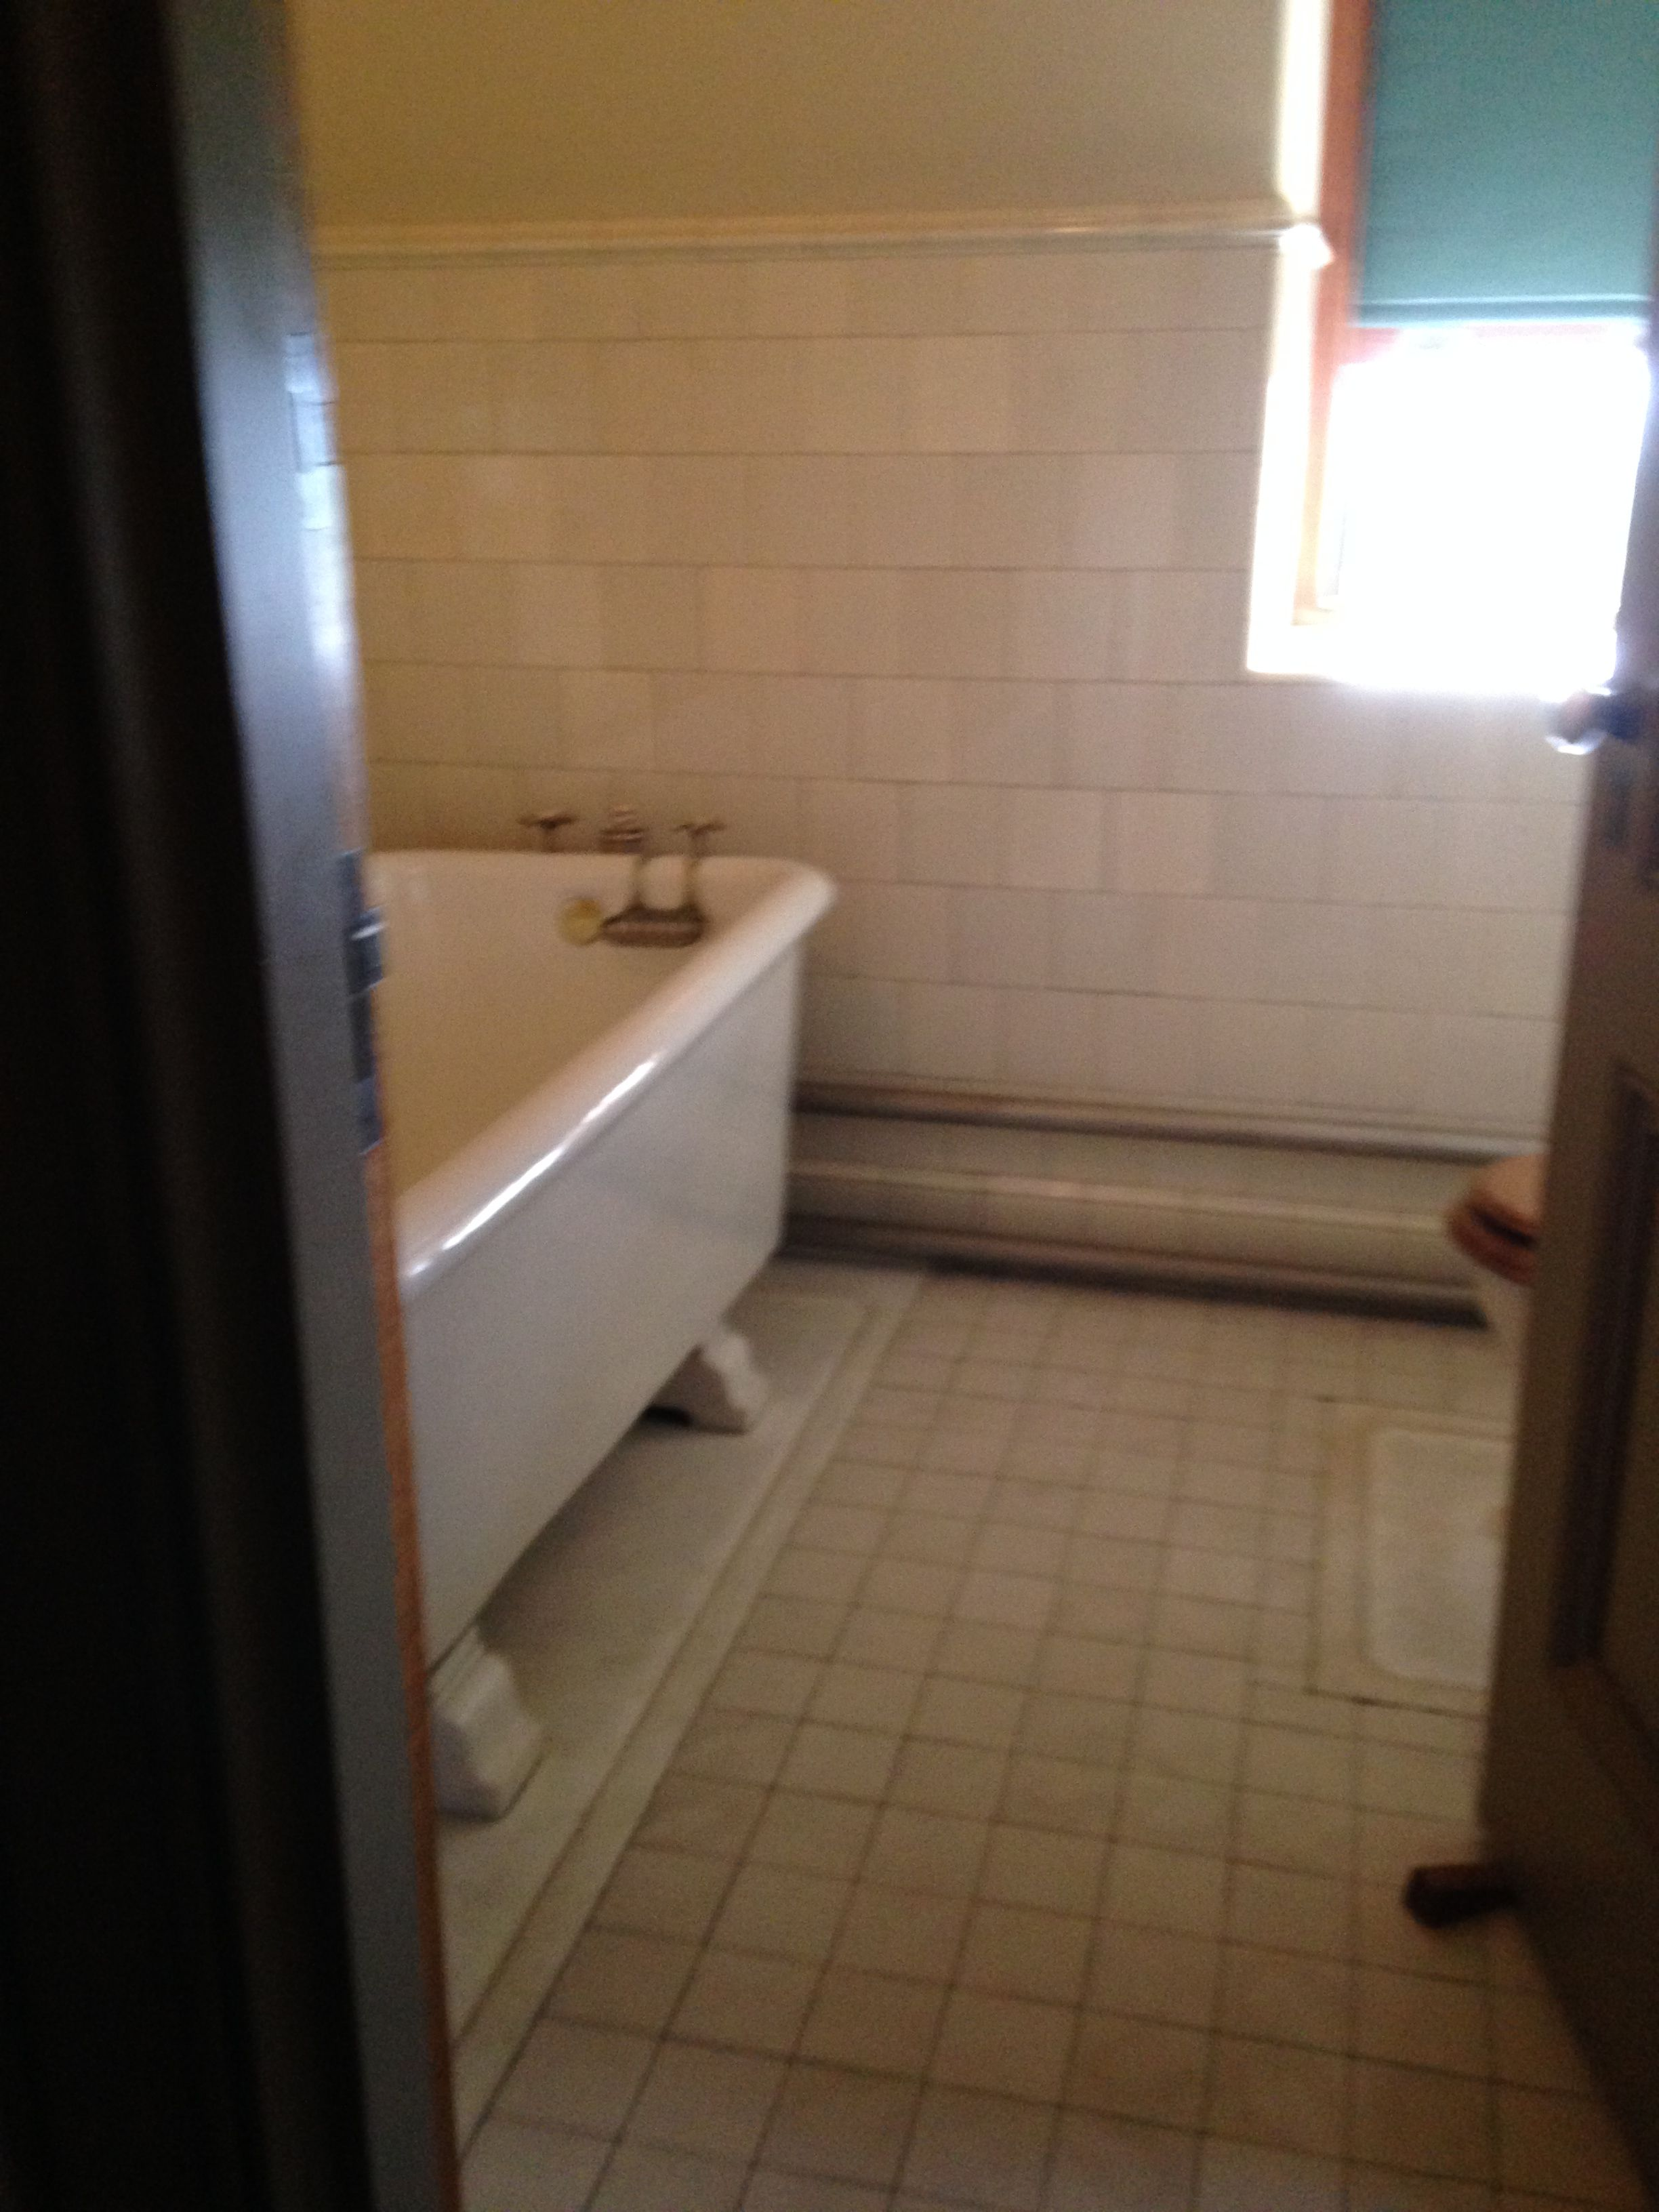 Biltmore house 3rd floor watson bedroom on suite - 2 bedroom suites in asheville nc ...